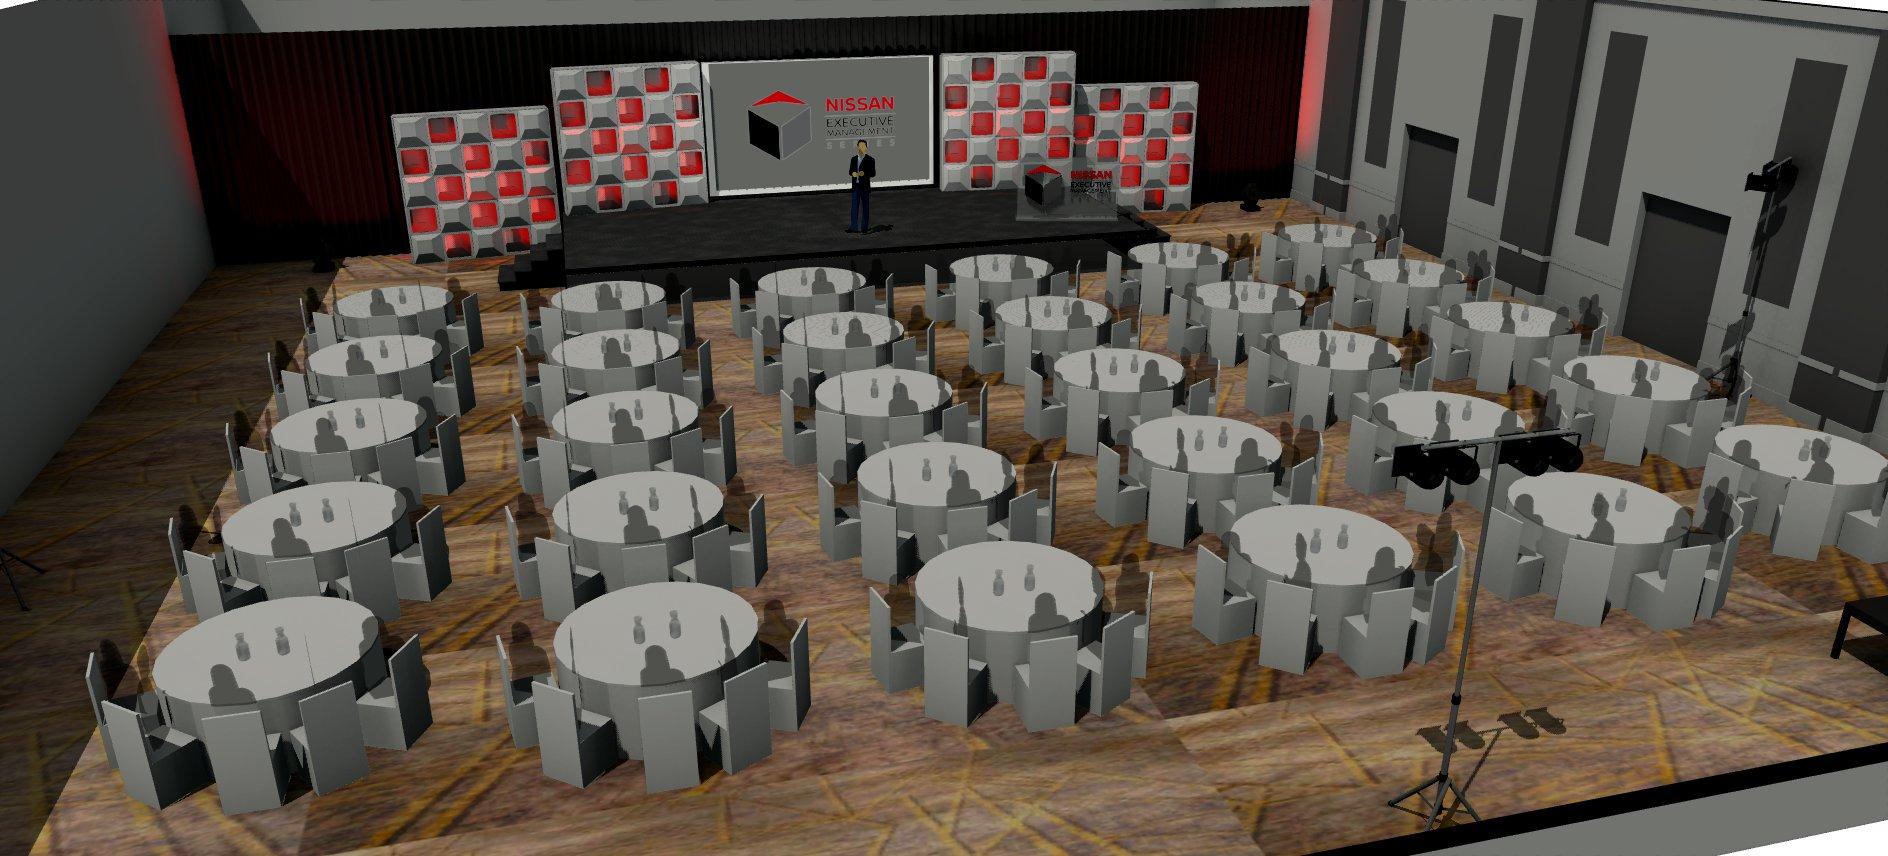 Nissan Training Seminar